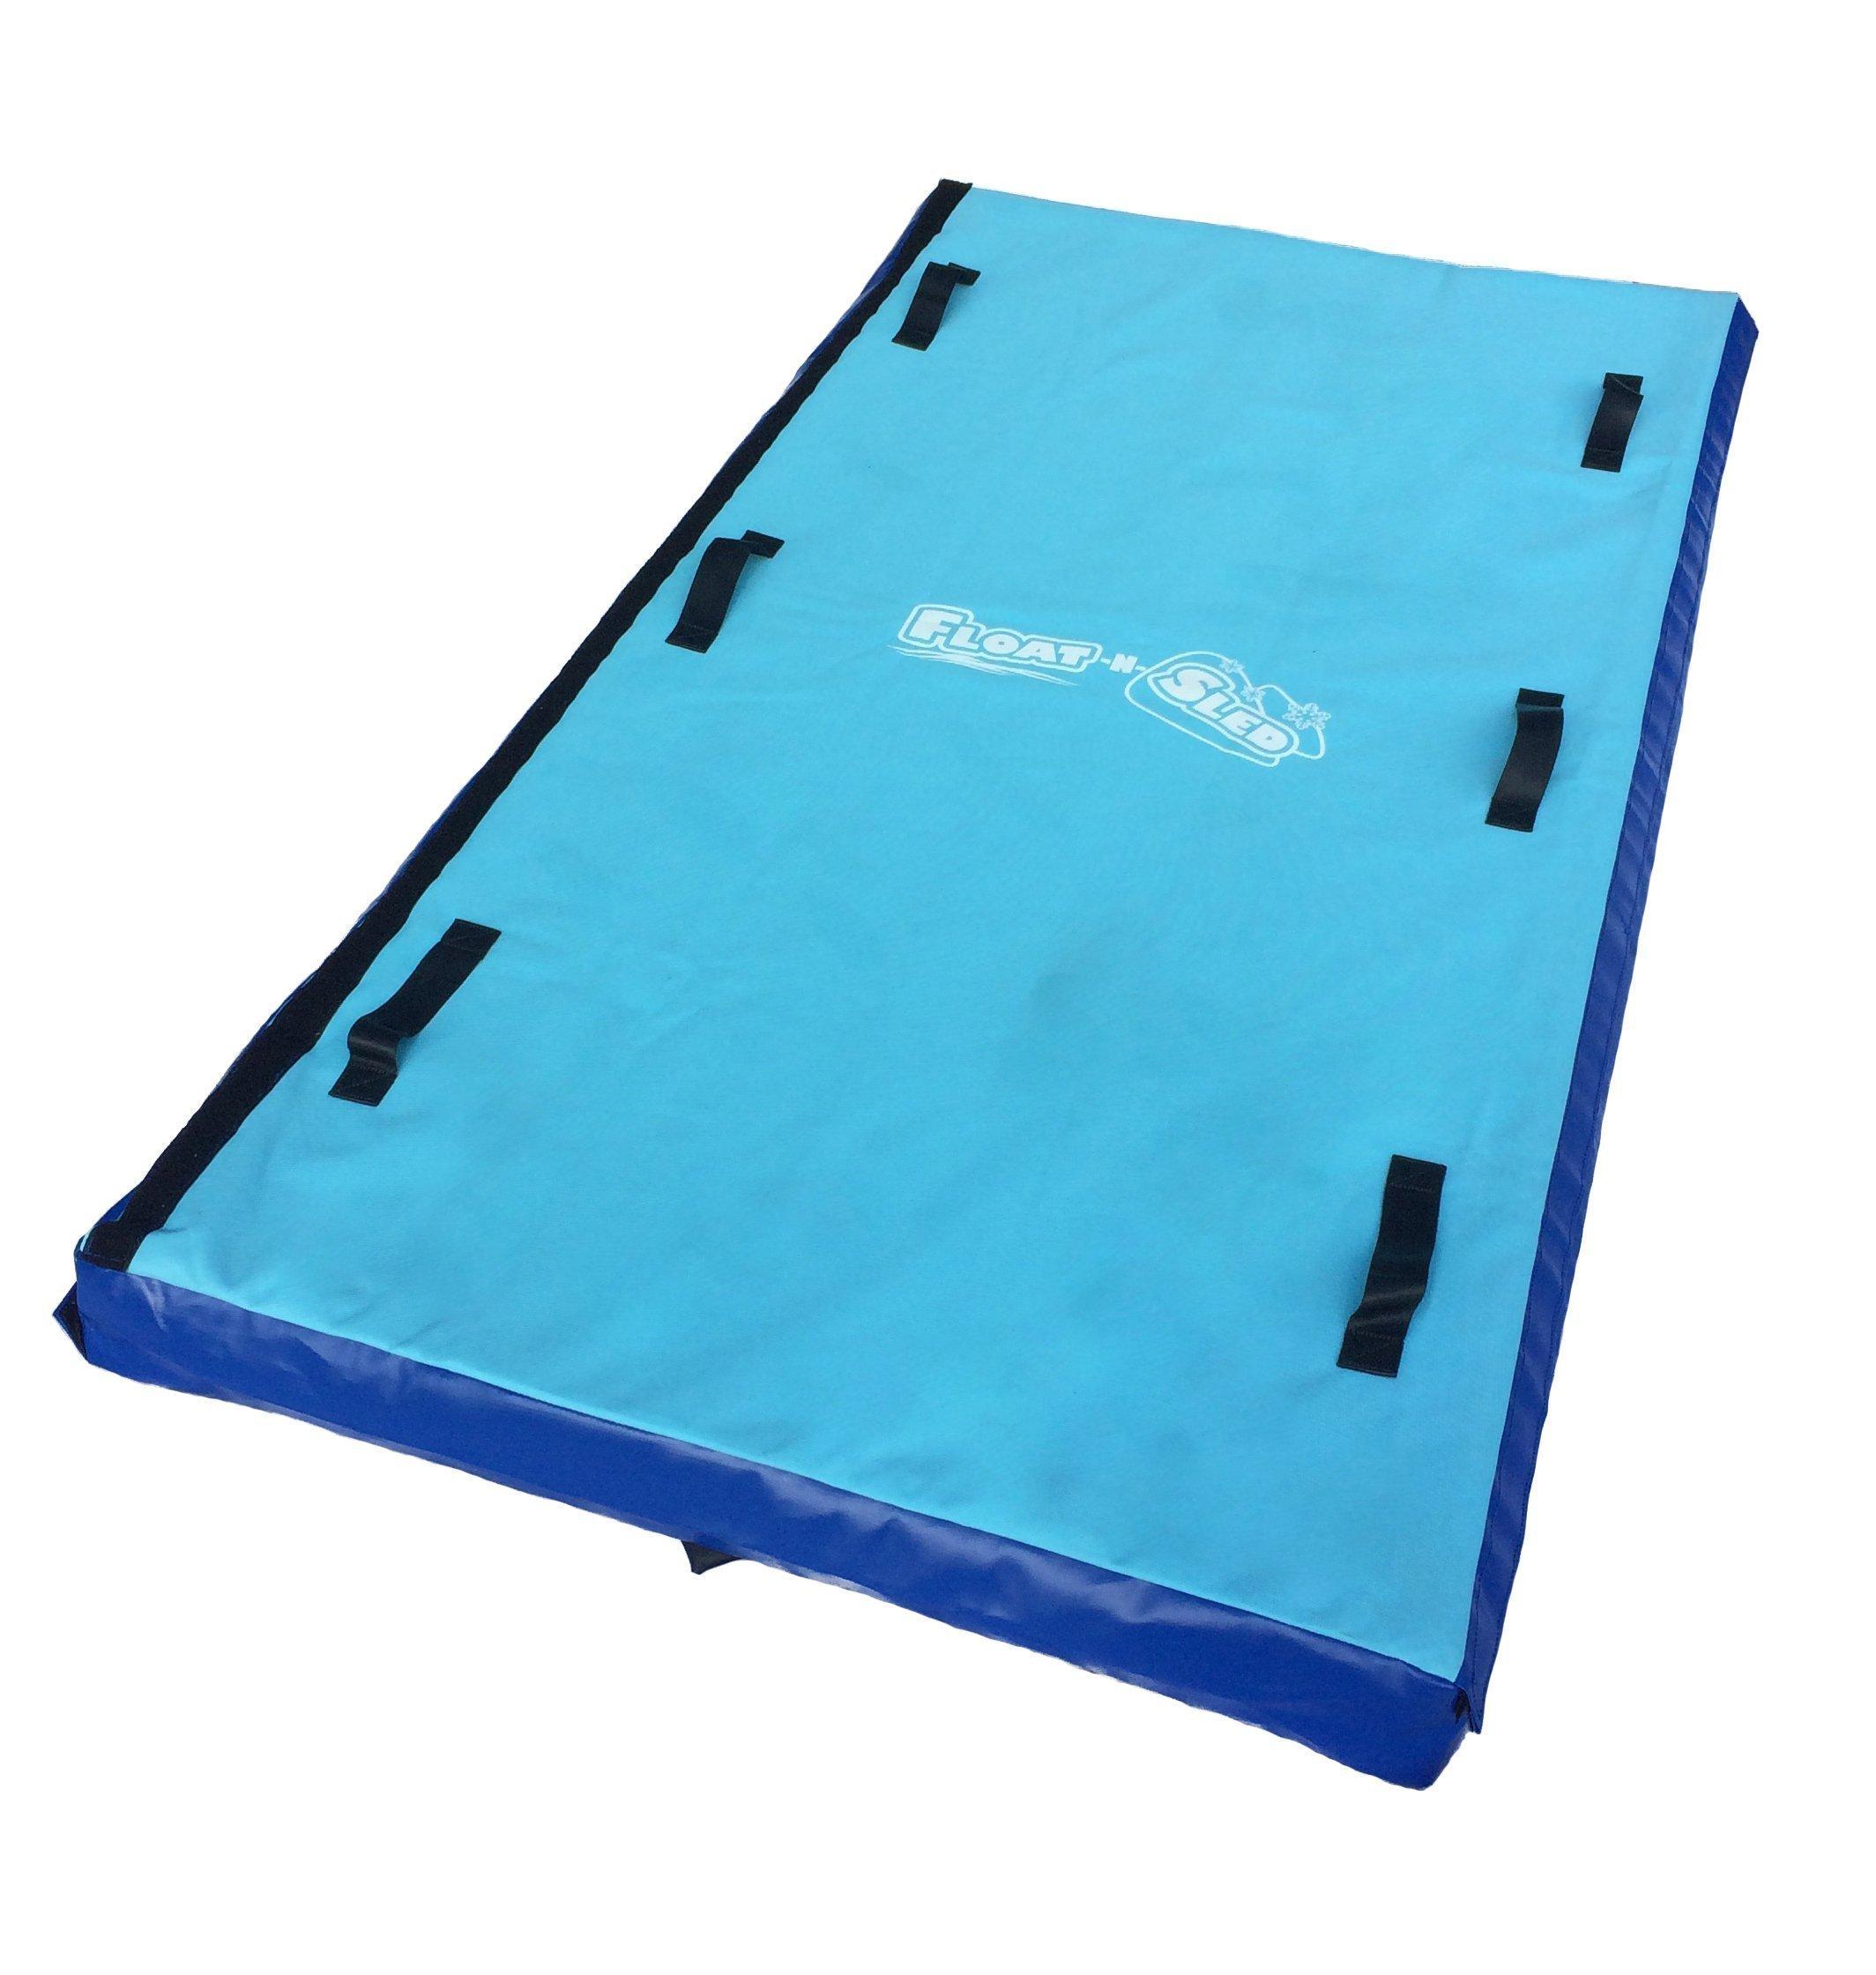 Float-N-Sled Swim Raft - Portable Platform - That Never Deflates by FLOAT N SLED